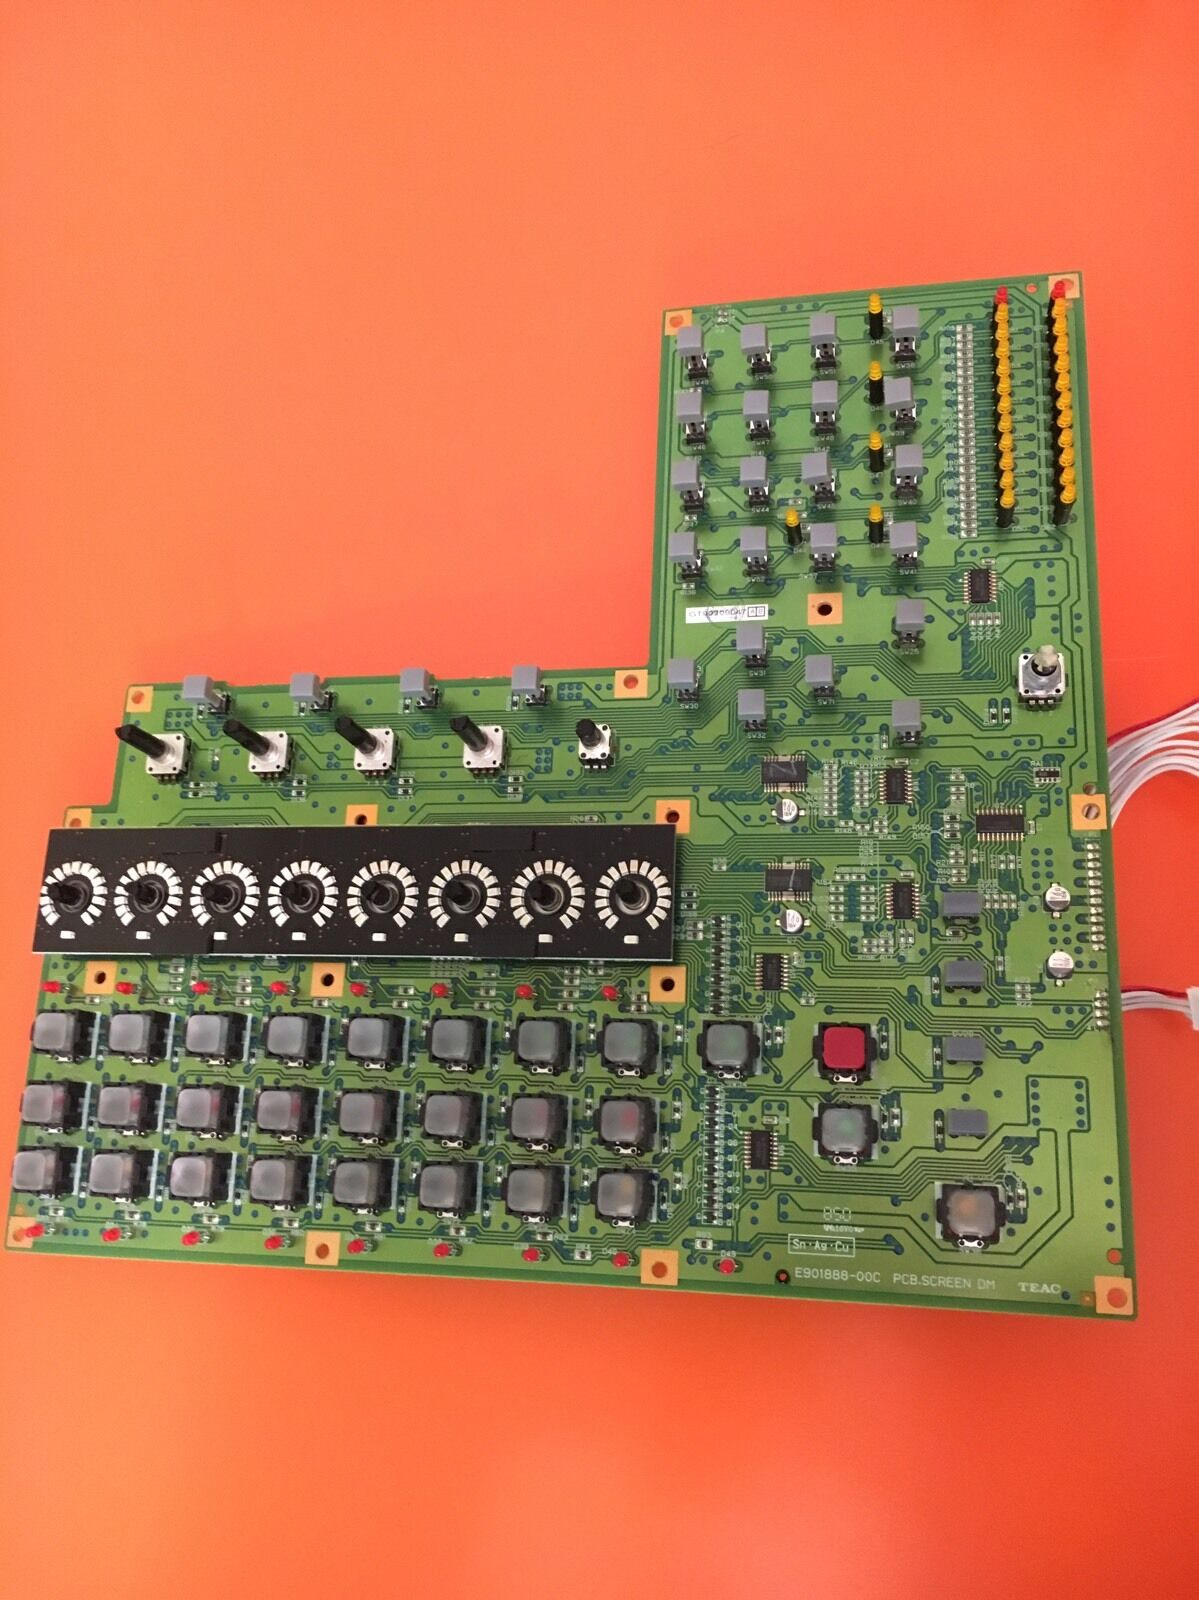 Tascam DM3200 DM4800 Screen Board - TEAC E901888-00C PCB.SCREEN DM